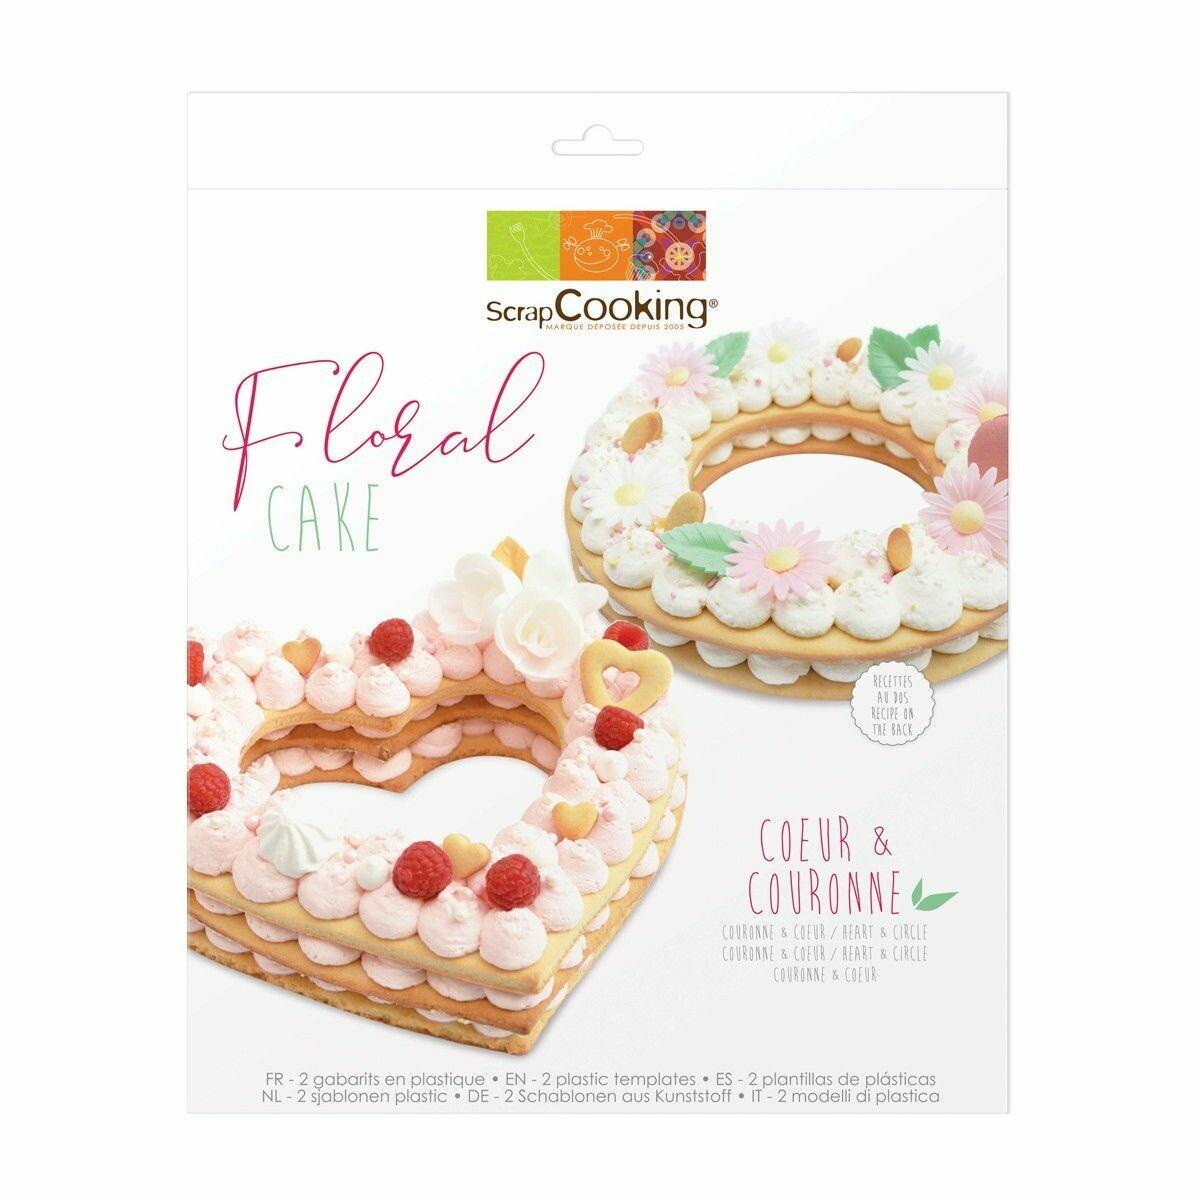 Scrapcooking Cookie Template -FLORAL Set of 2 - Πρότυπο για κατασκευή μεγάλου μπισκότου σε σχήμα Καρδιάς και Κύκλου